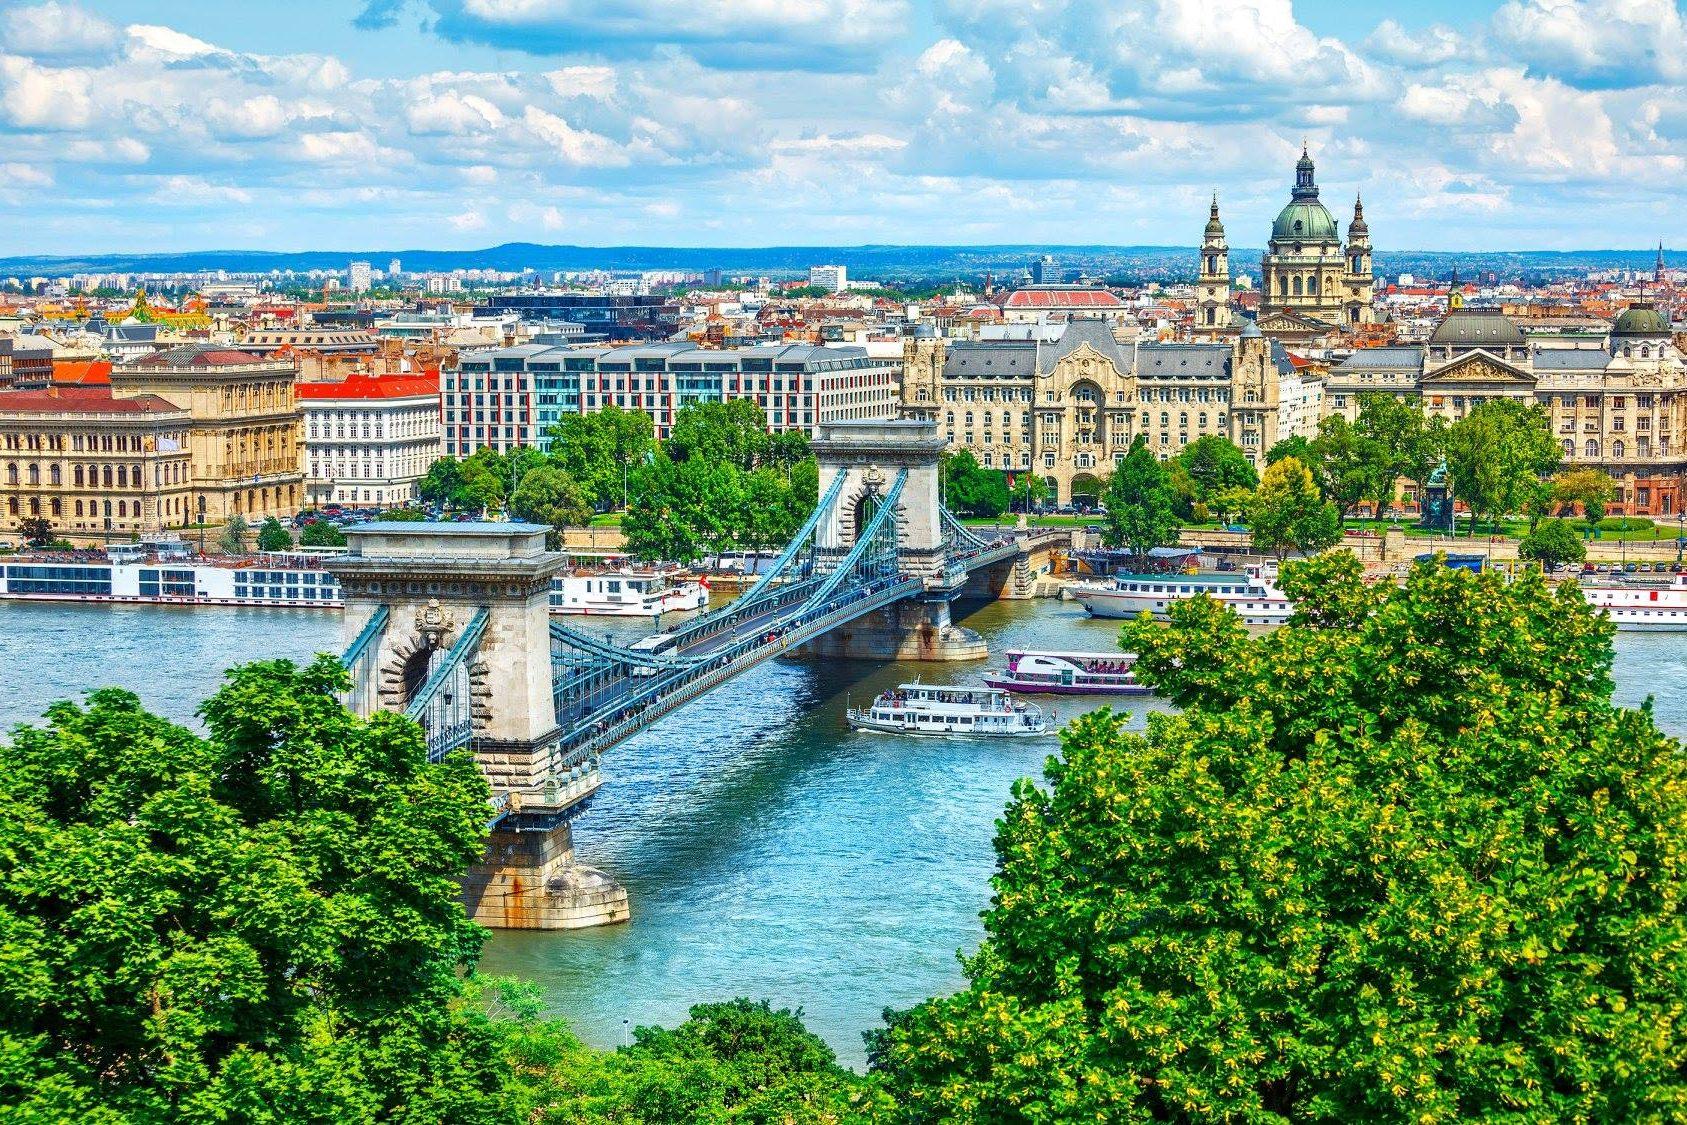 Danube River Cruises With Uniworld